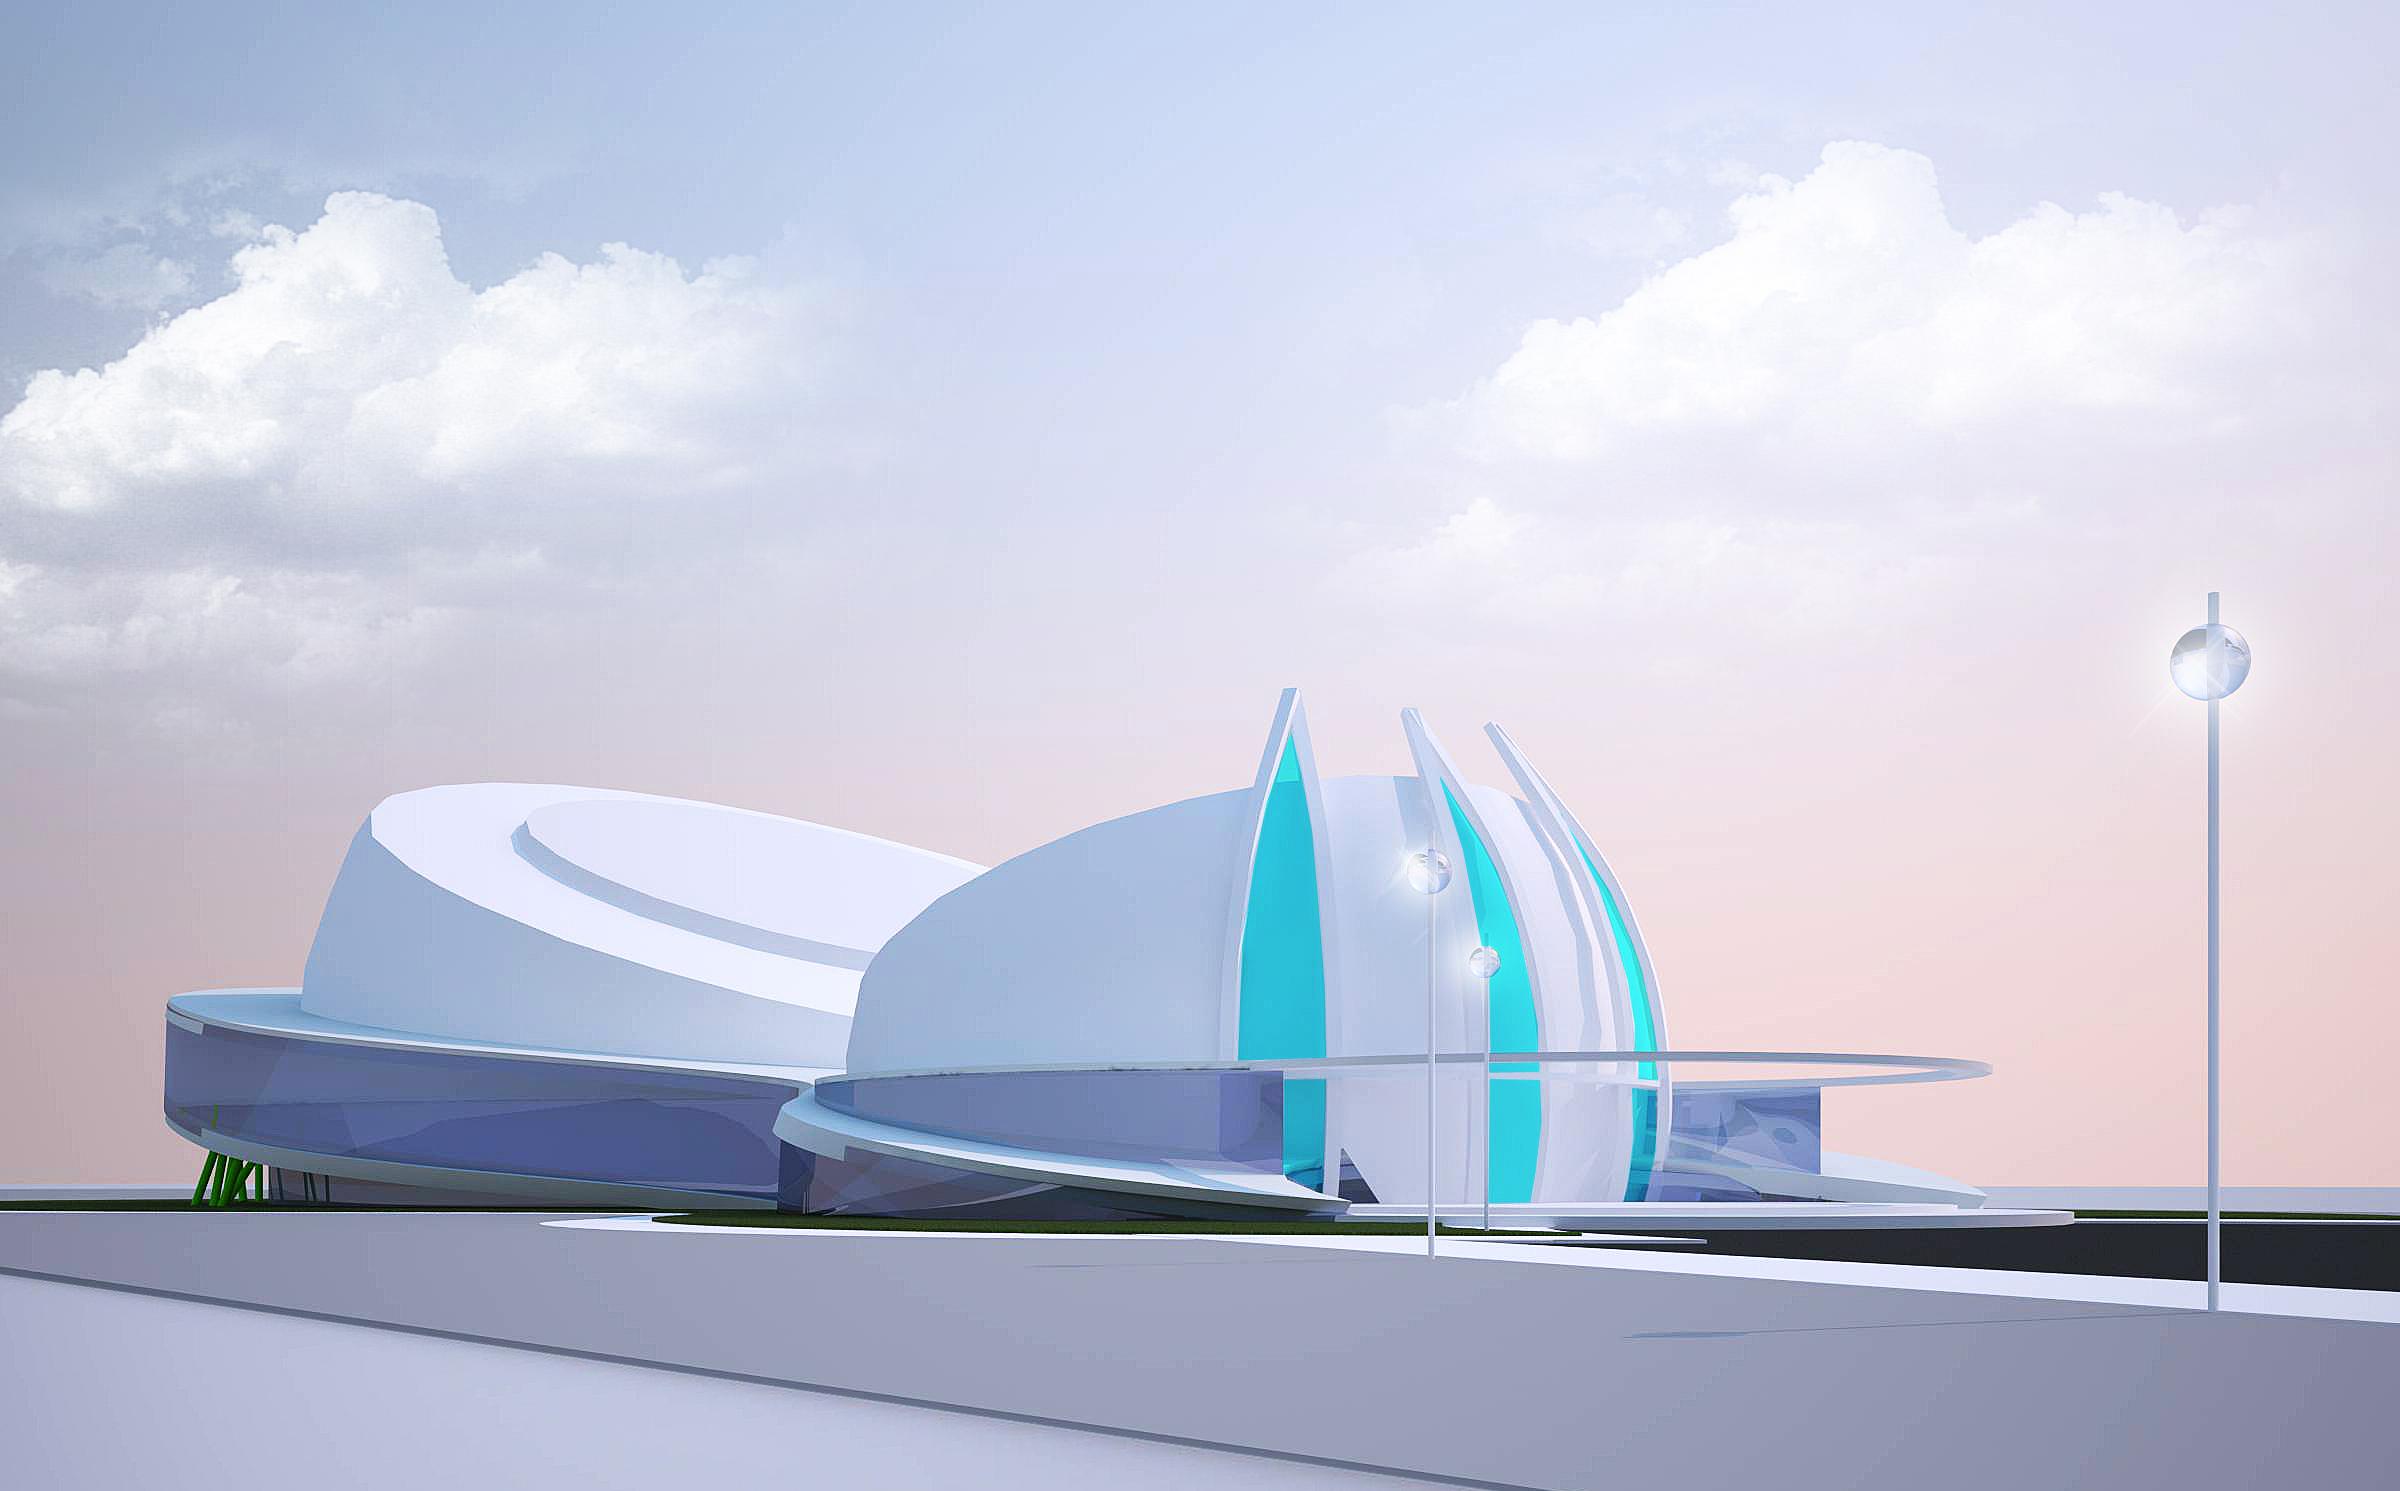 Разработка архитектурной концепции театра оперы и балета фото f_76452eb525f458ce.jpg